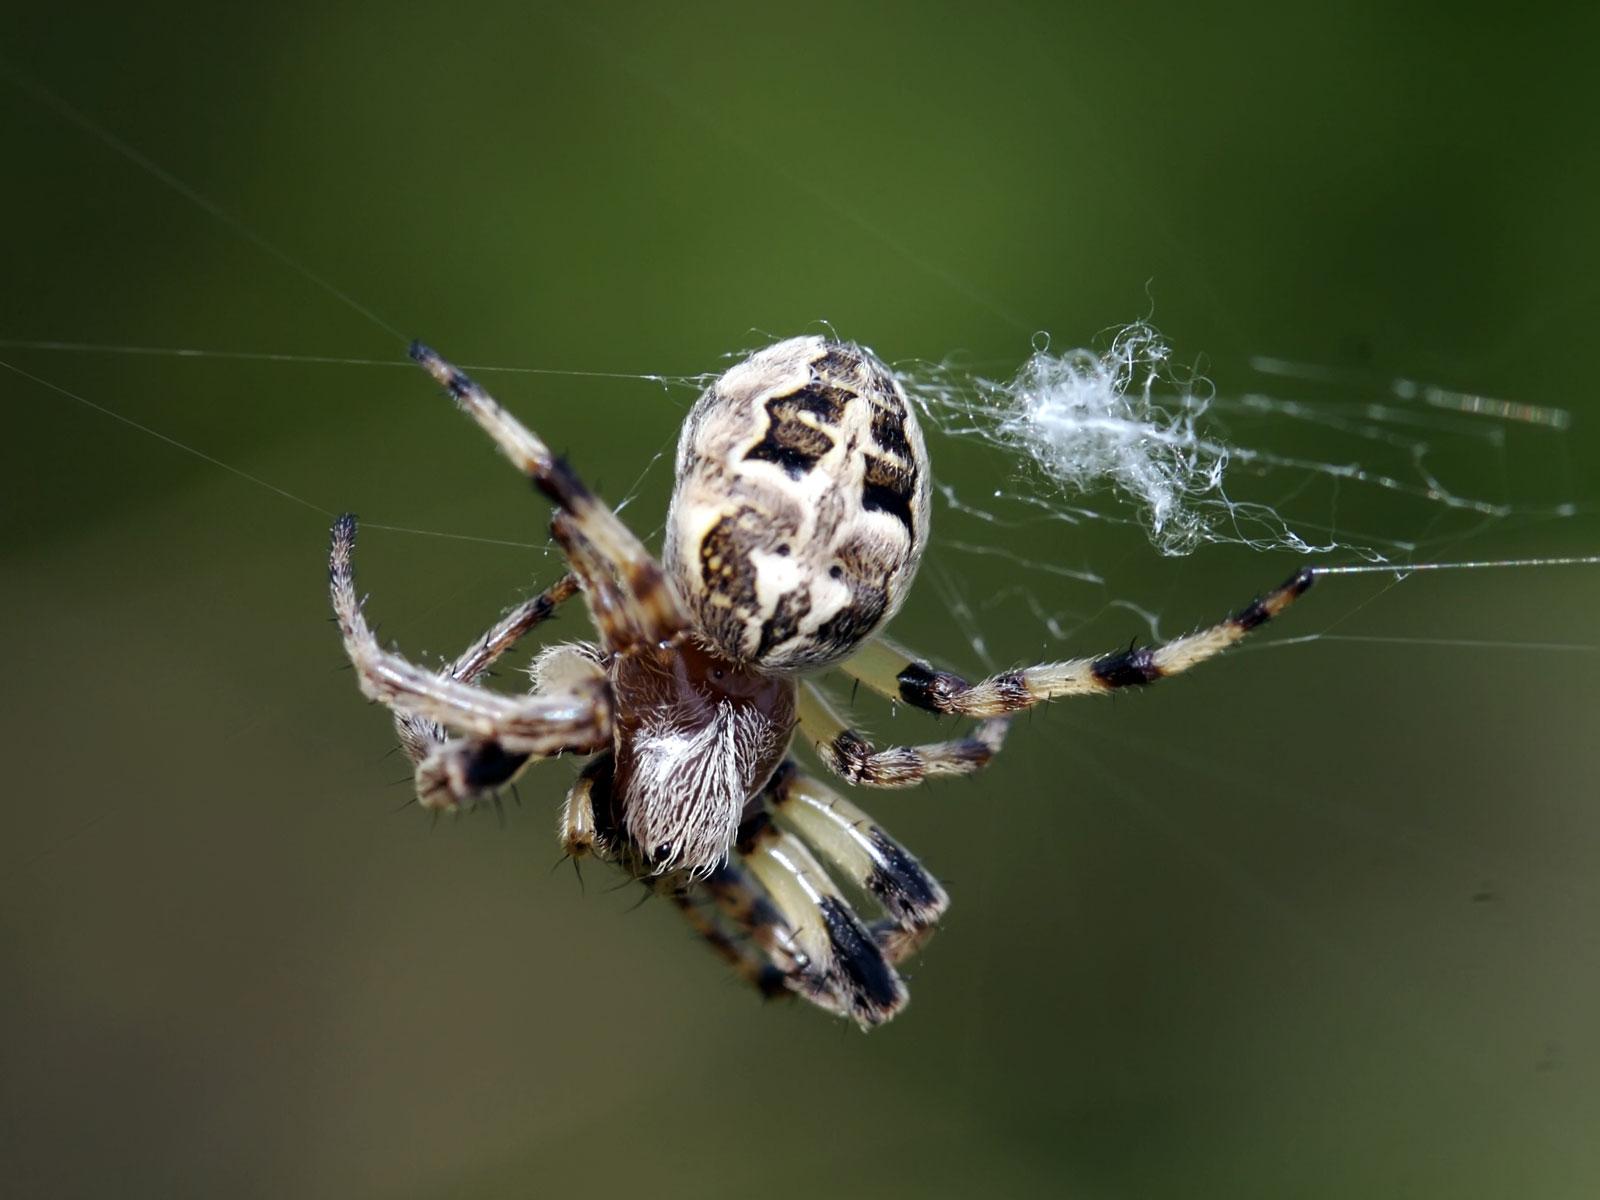 WALLPAPER image PICTURE photo SKETCH illustration Spider Wallpaper 1600x1200